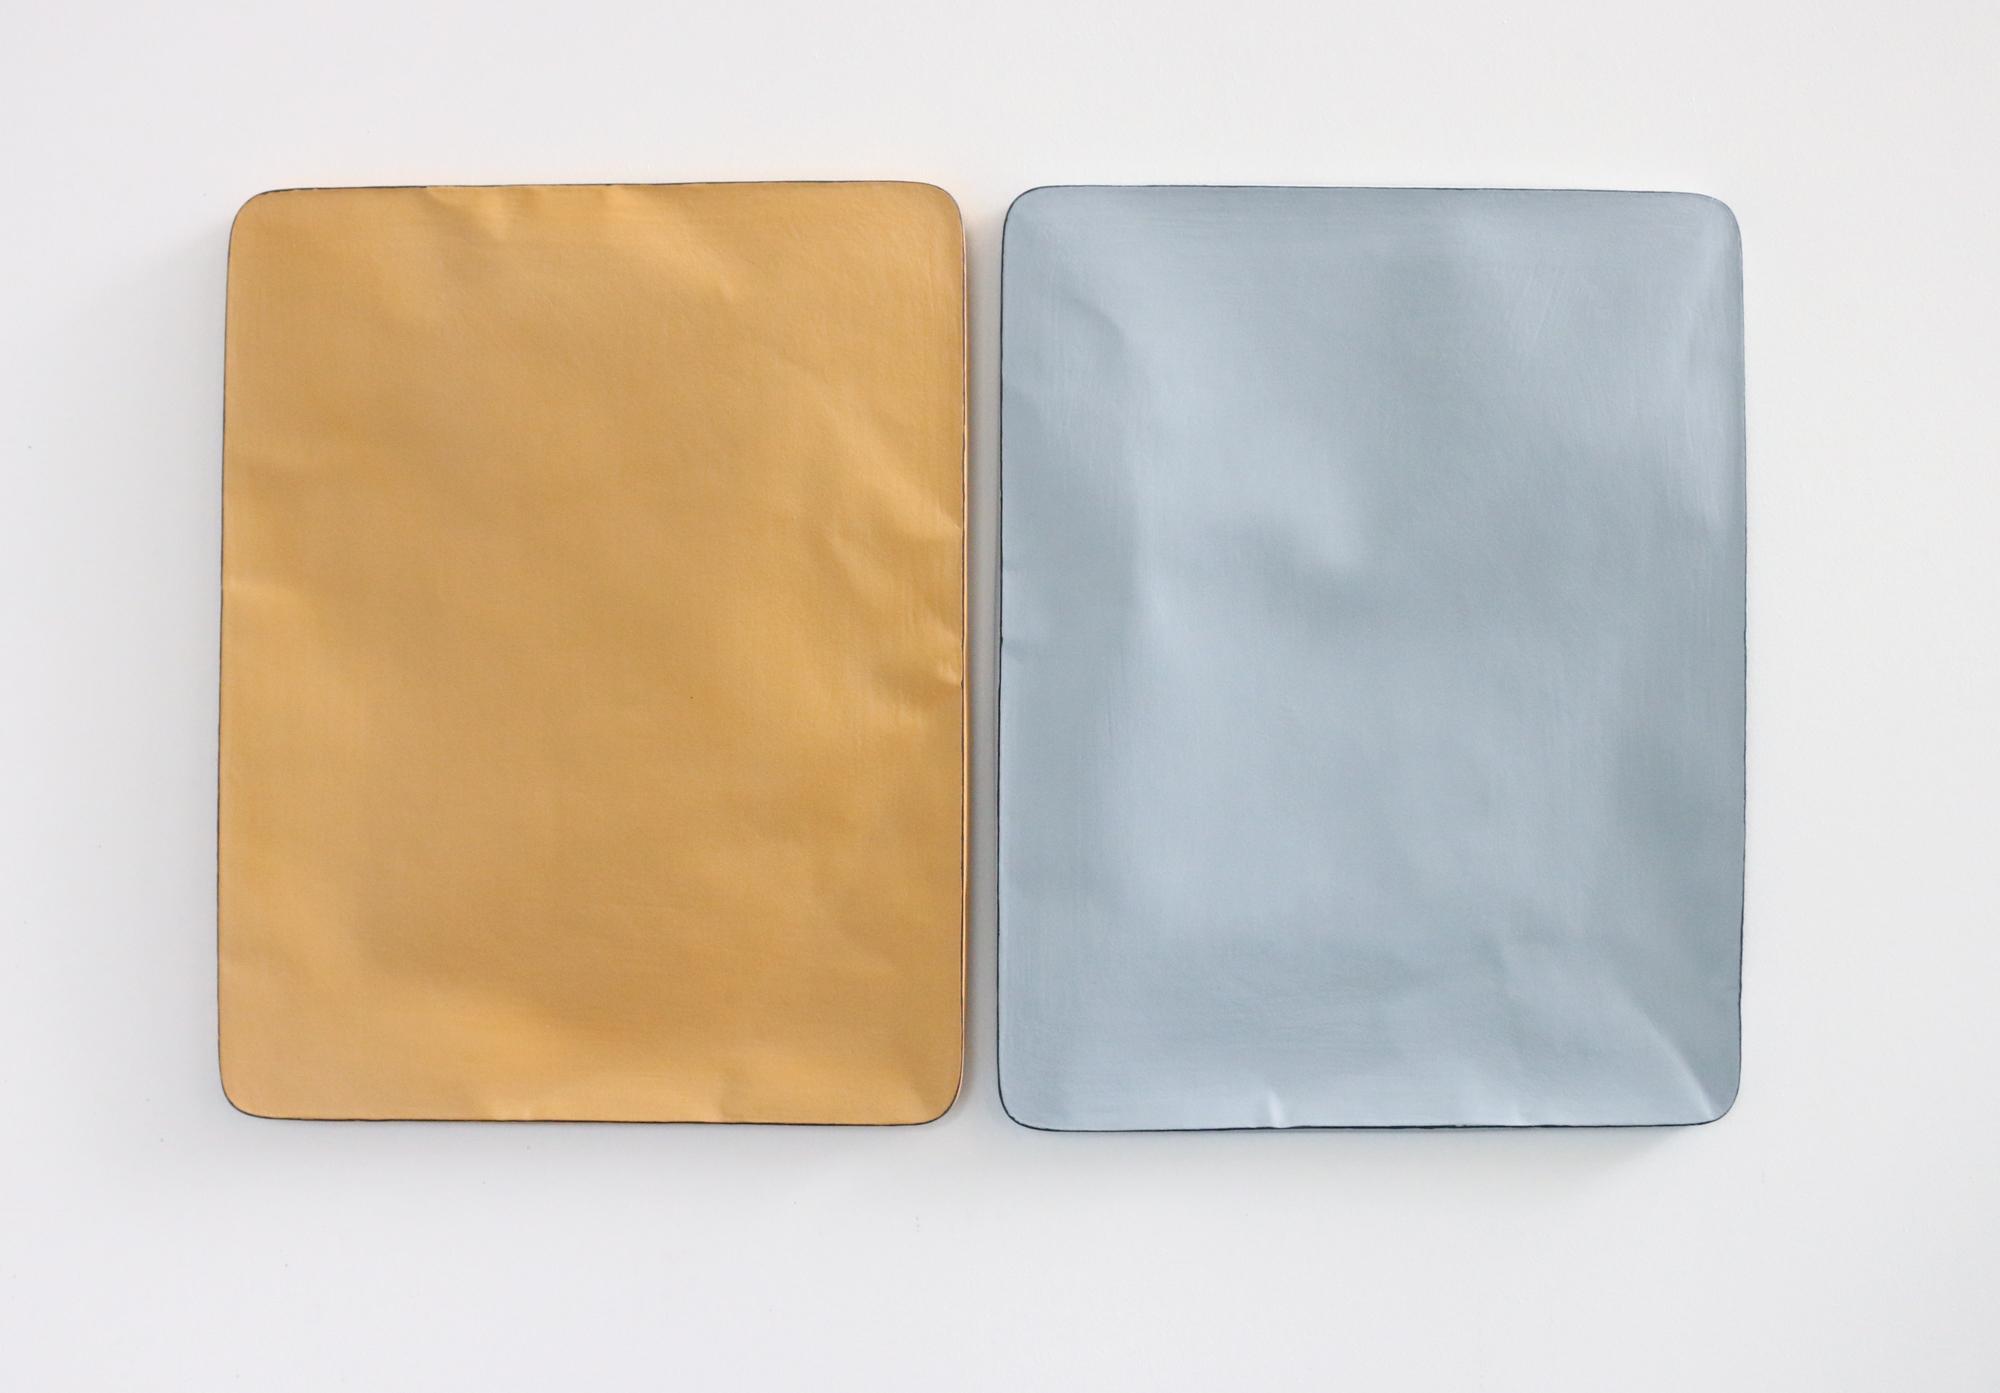 Johan De Wit, Untitled, 2018, Paper, Resin, Marble, Acrylic, 76 x 46.5 x 2 cm, Affinity Art